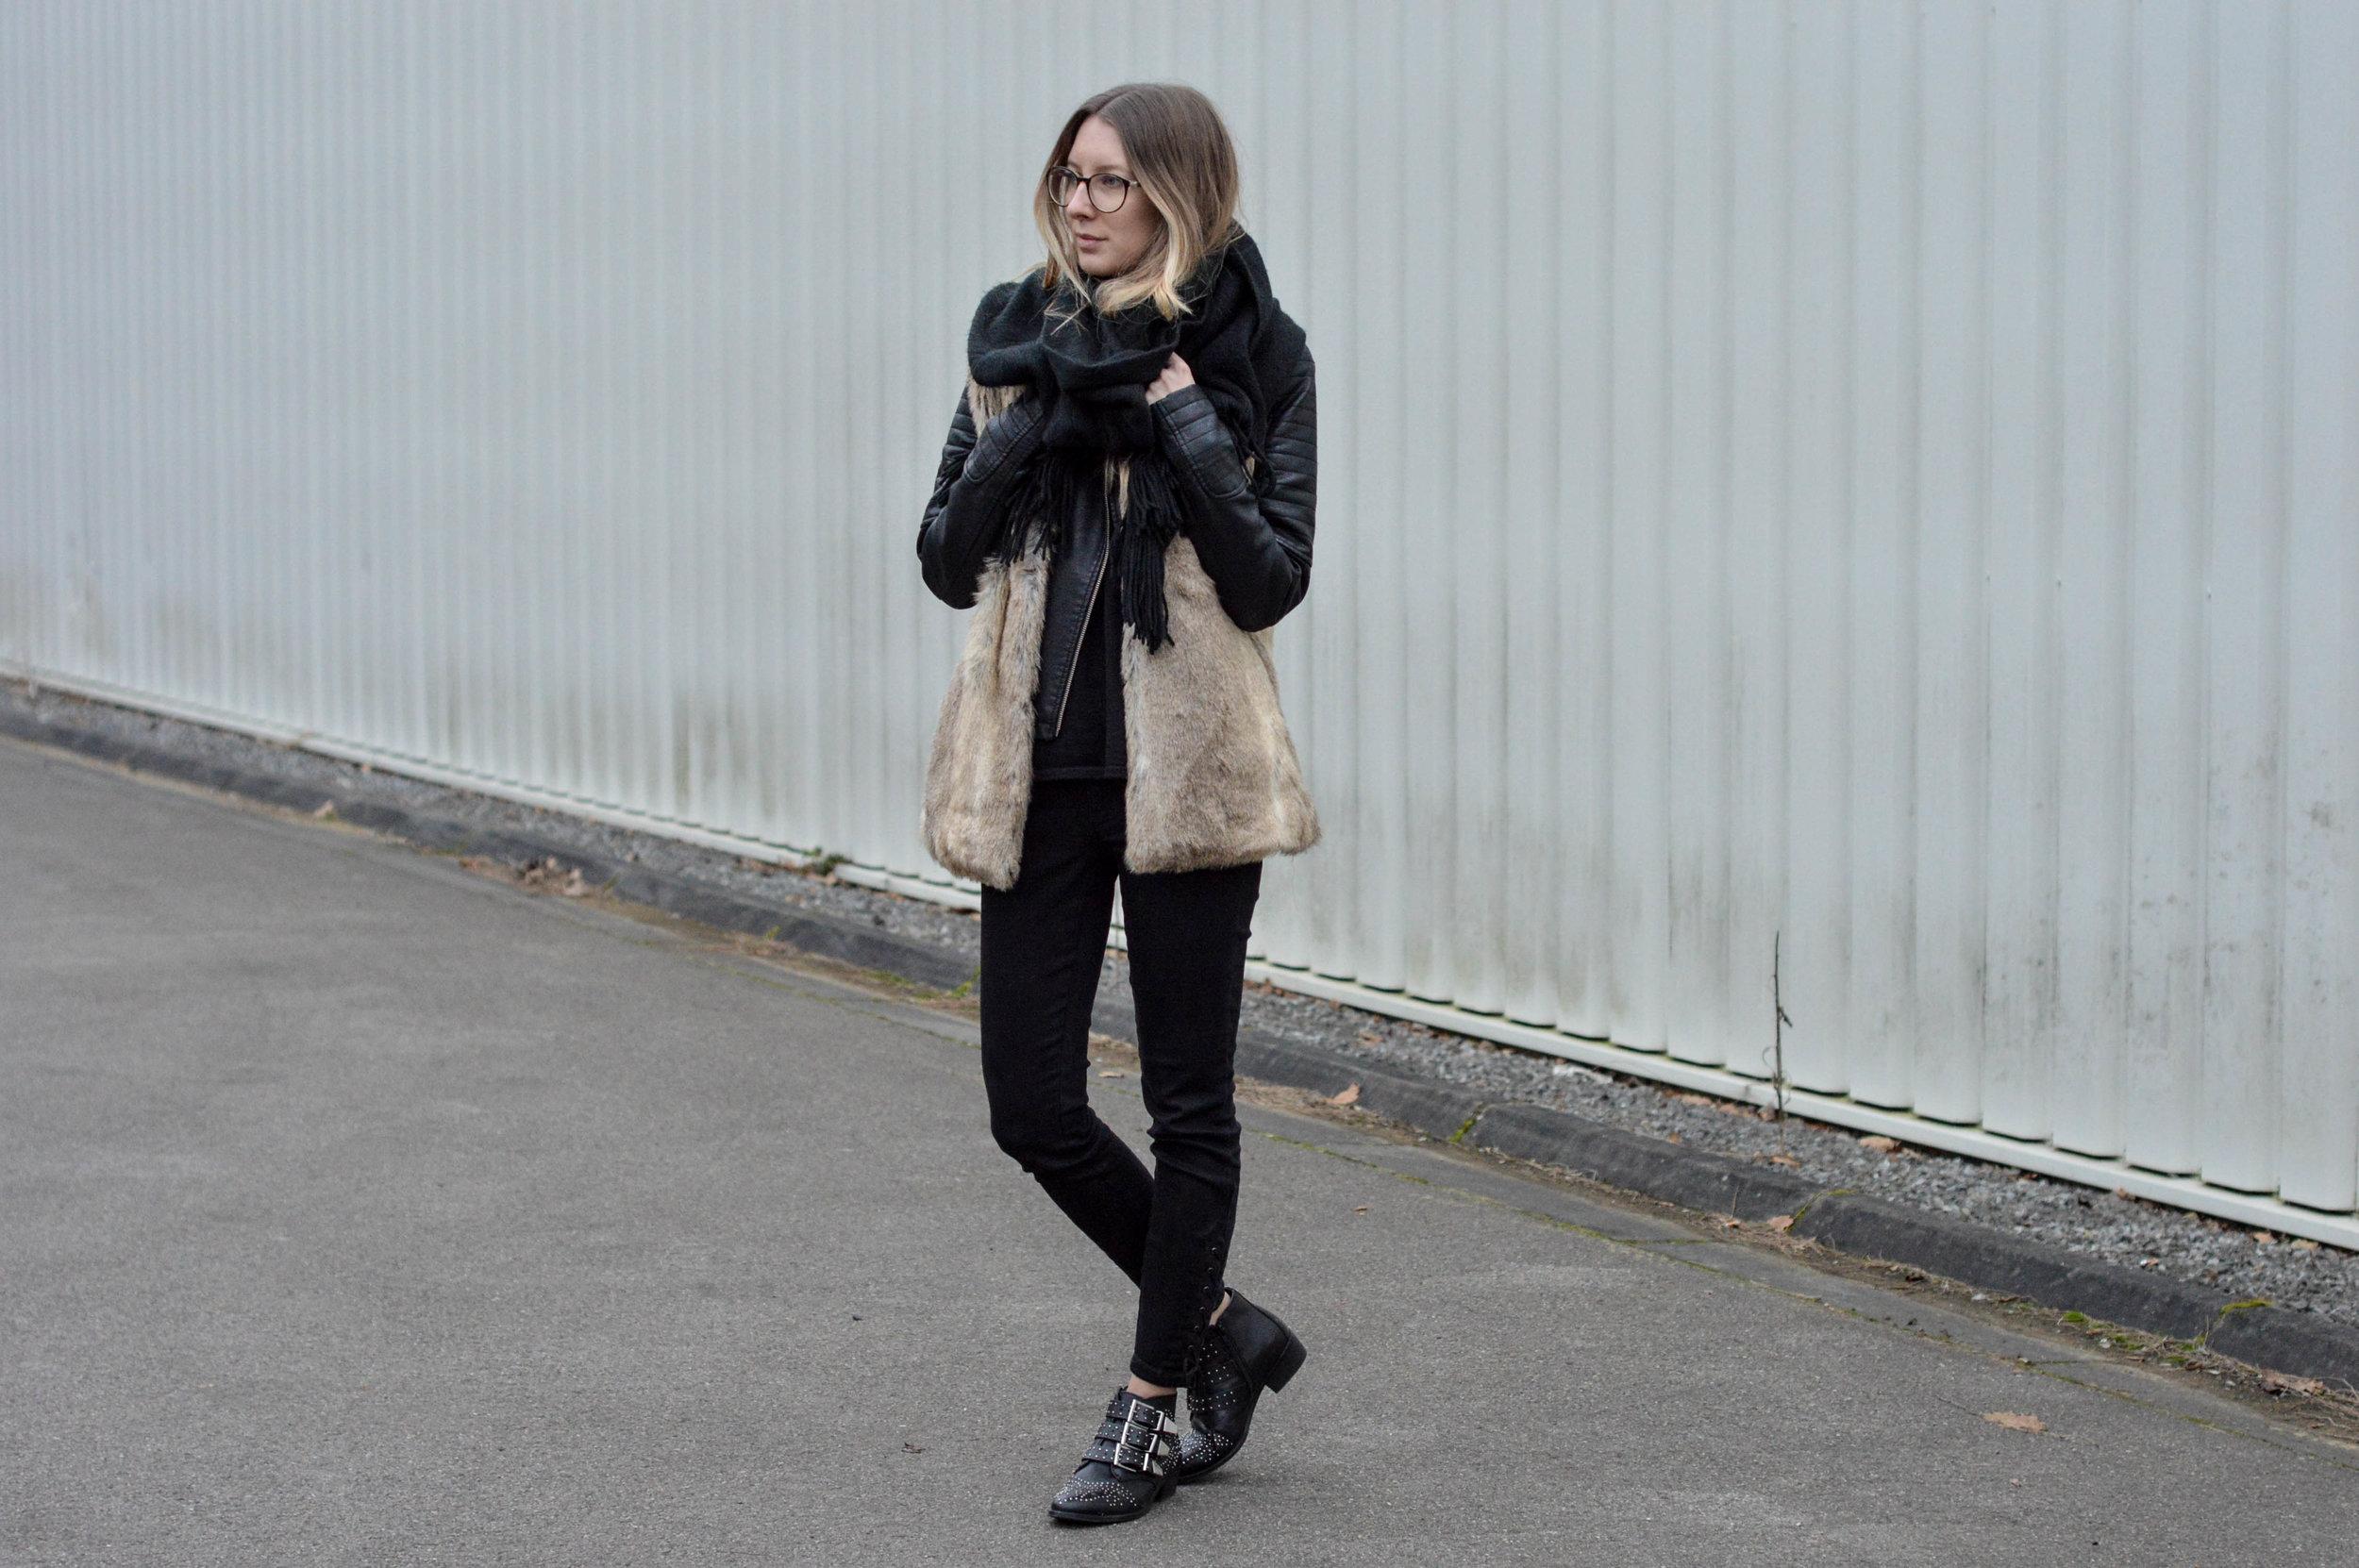 Faux Fur Jacket - OSIARAH.COM (13 of 17).jpg